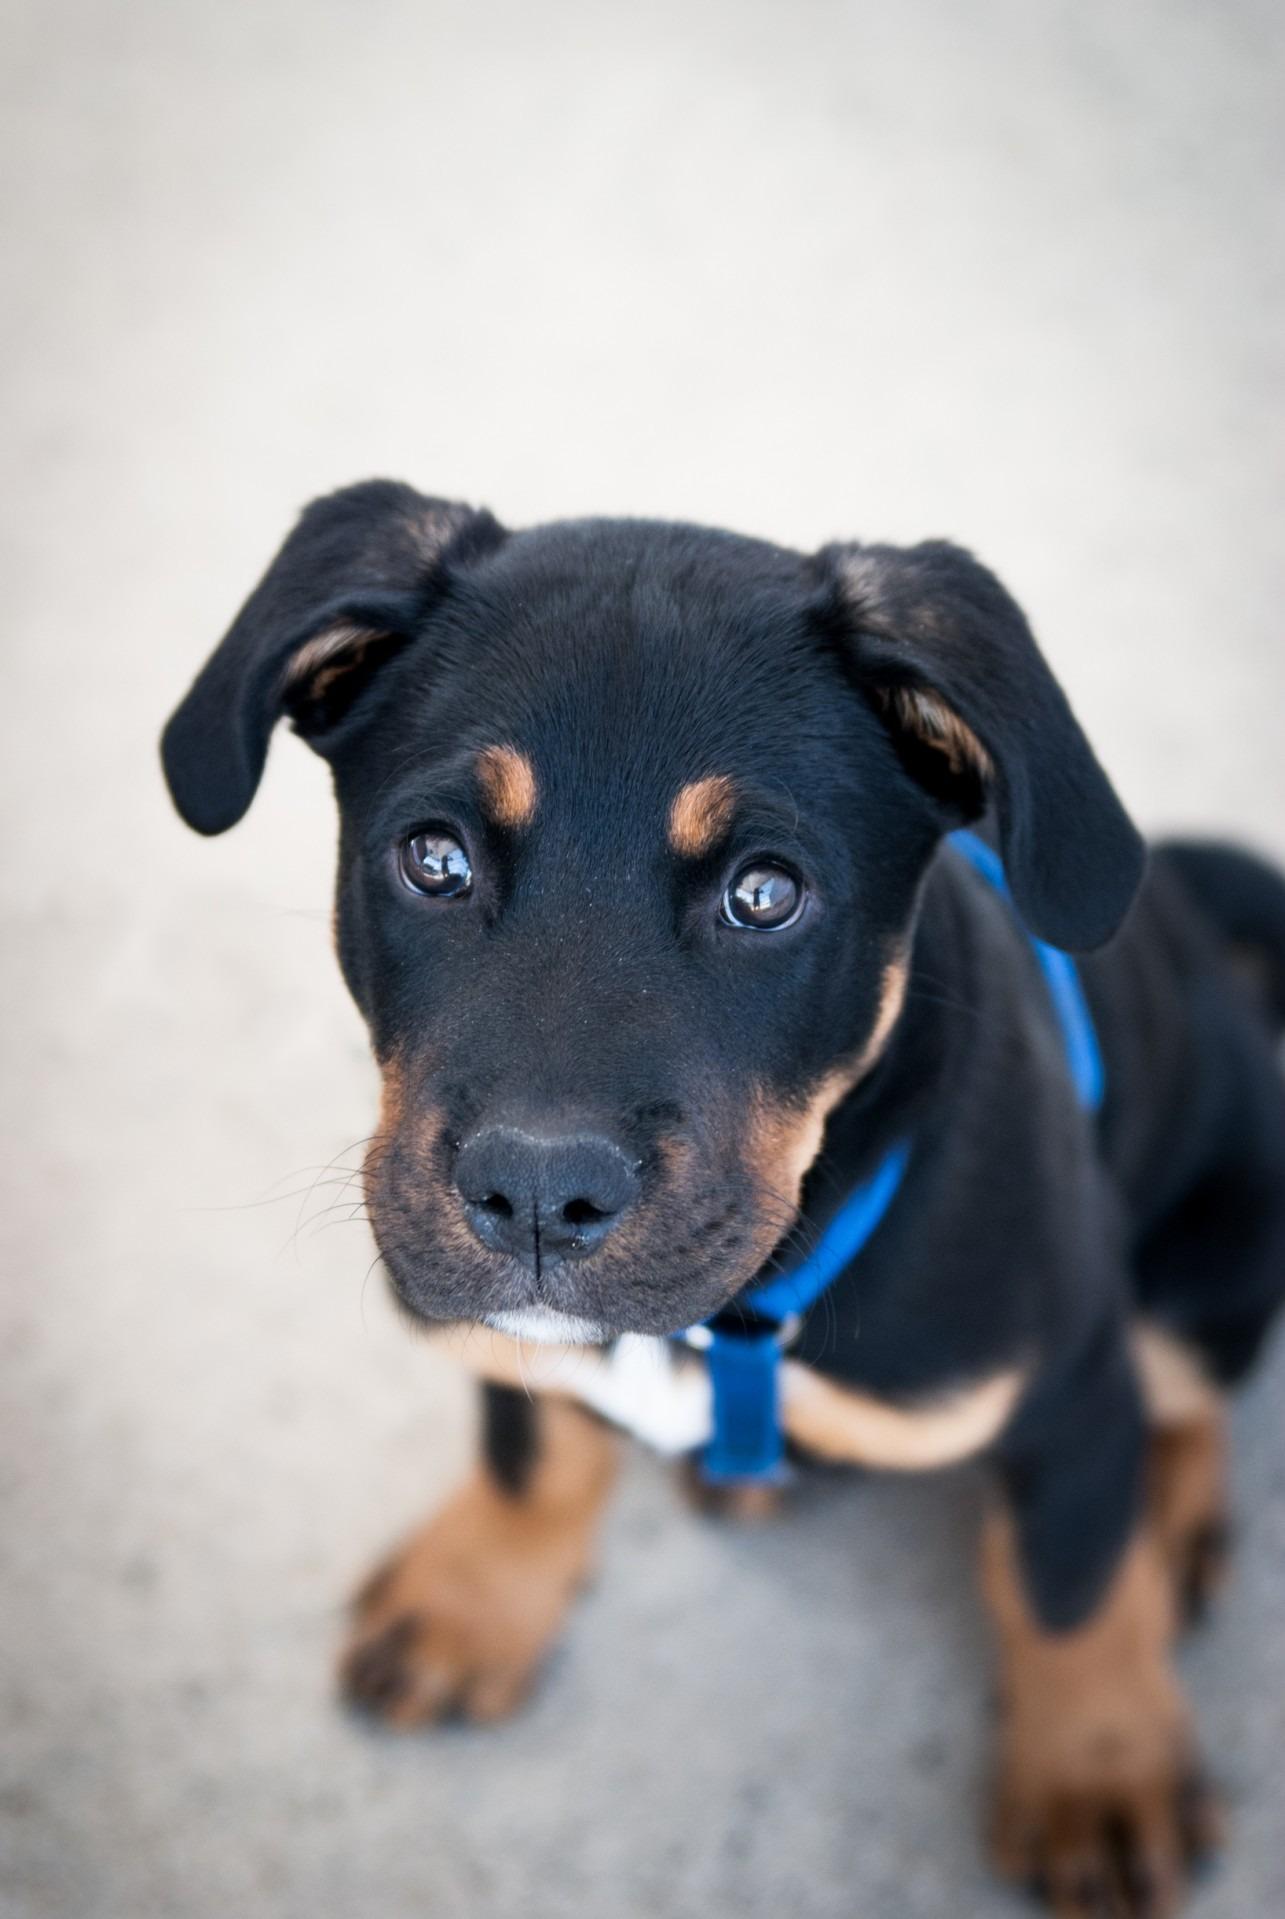 Best Puppy Black Adorable Dog - puppy-dog-animal-cute-mammal-blue-black-black-dog-pets-vertebrate-adorable-dog-breed-dog-like-mammal-1105690  HD_715529  .jpg